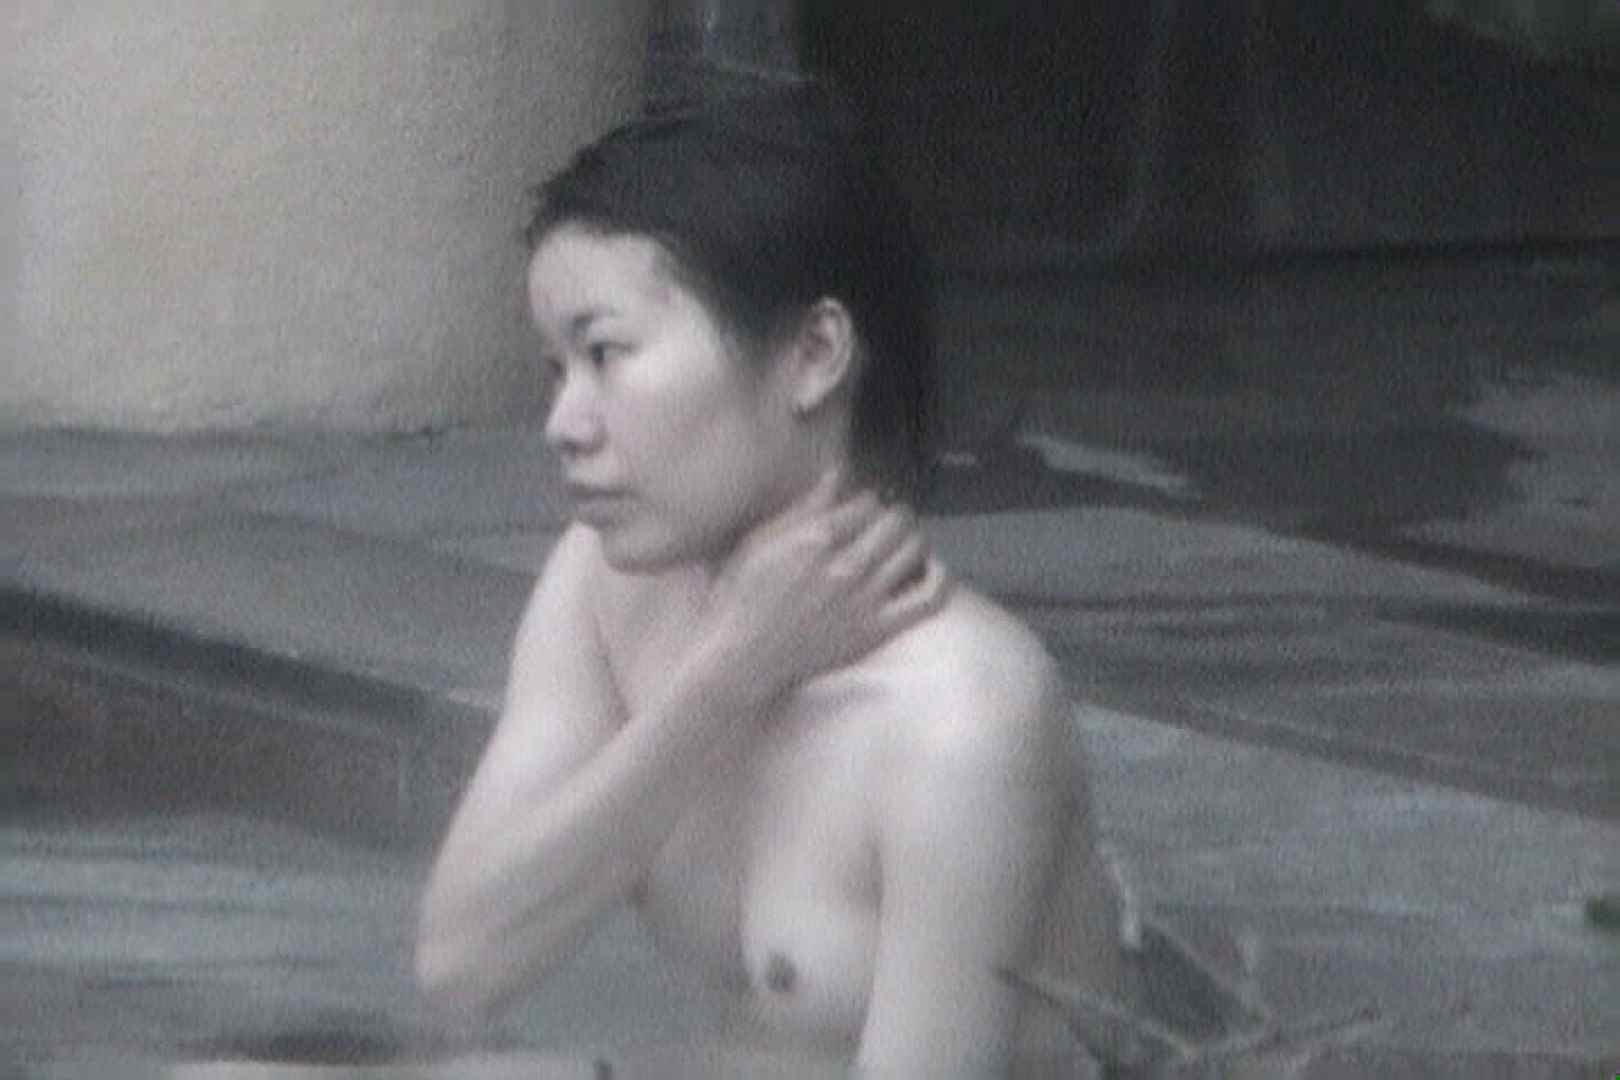 Aquaな露天風呂Vol.556 露天風呂編  99PIX 70